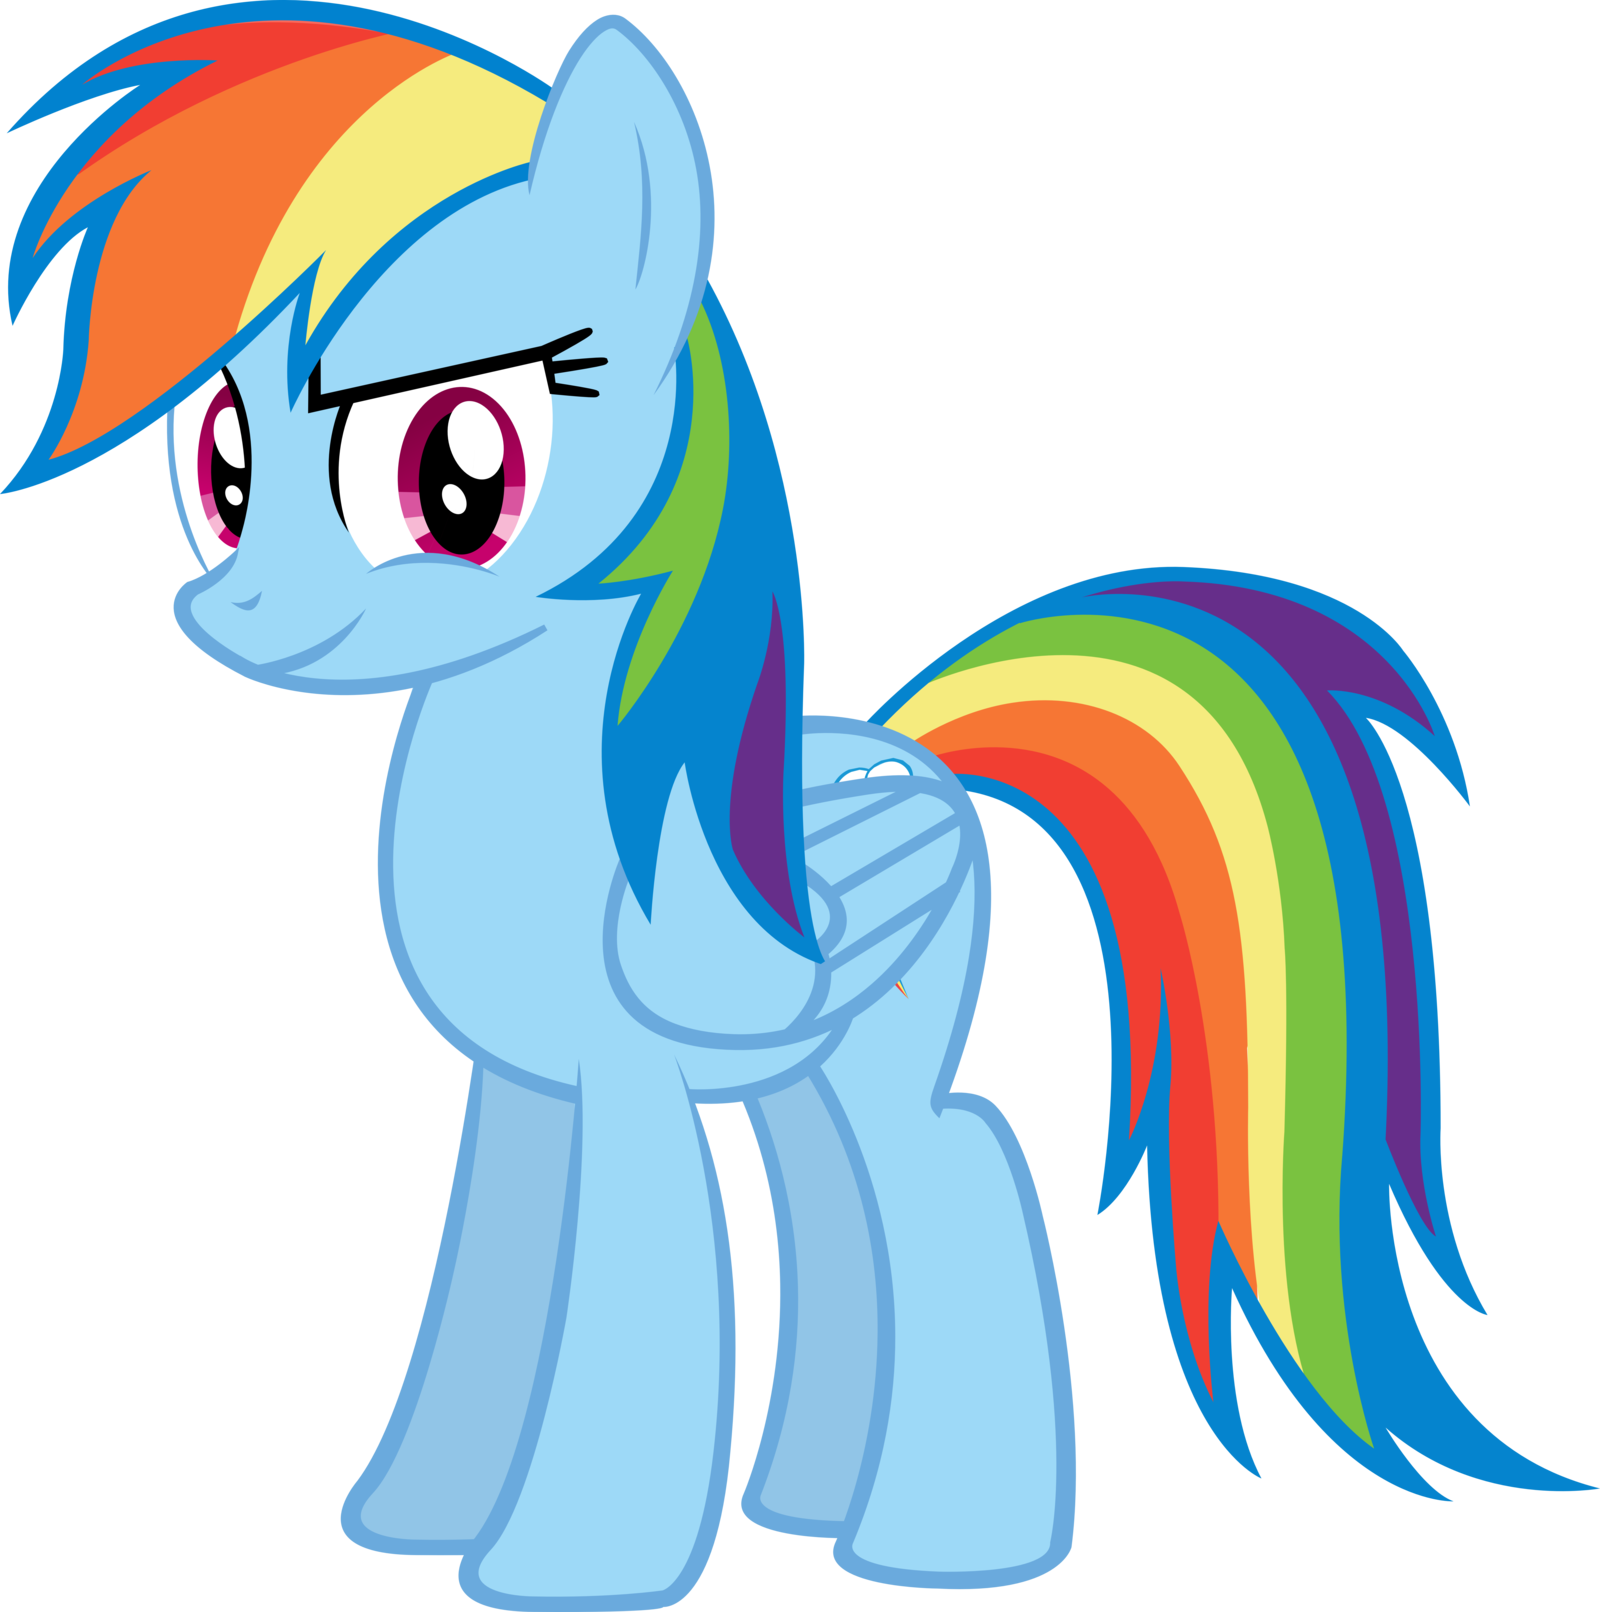 Rainbow Dash Png Image - Rainbow...